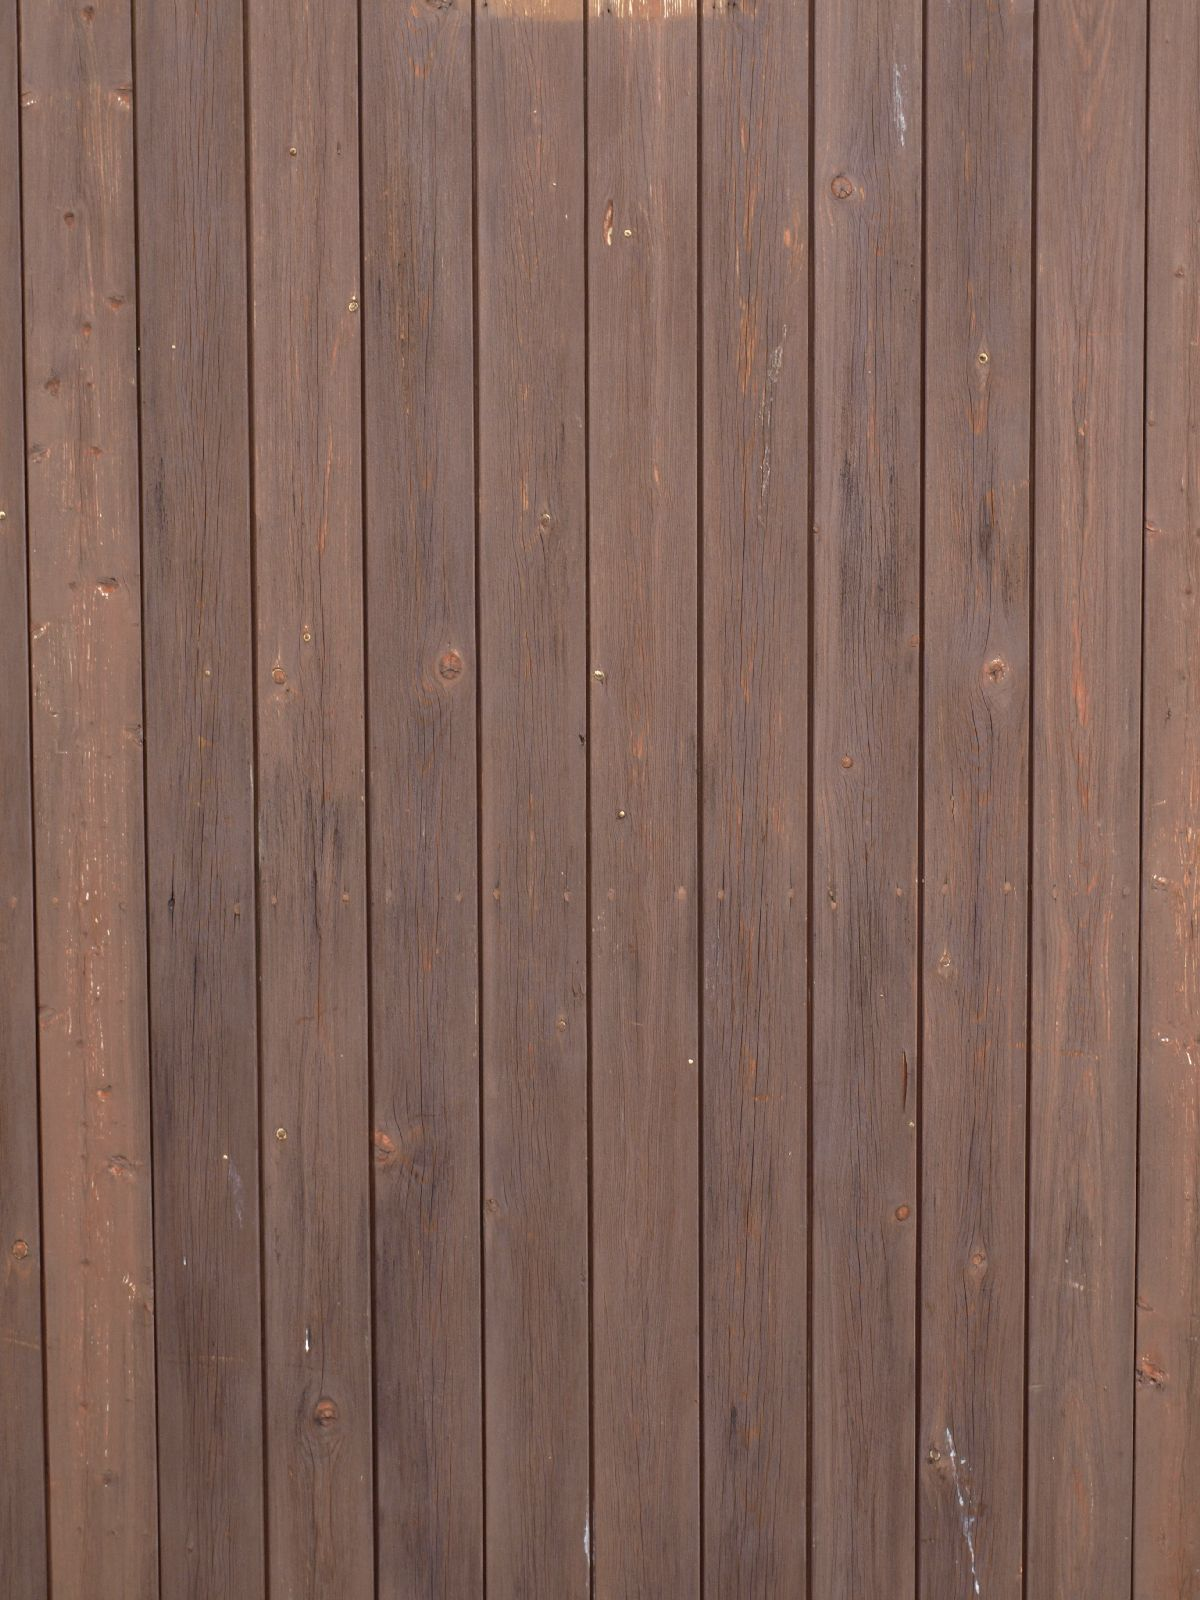 Wood_Texture_A_P8164437